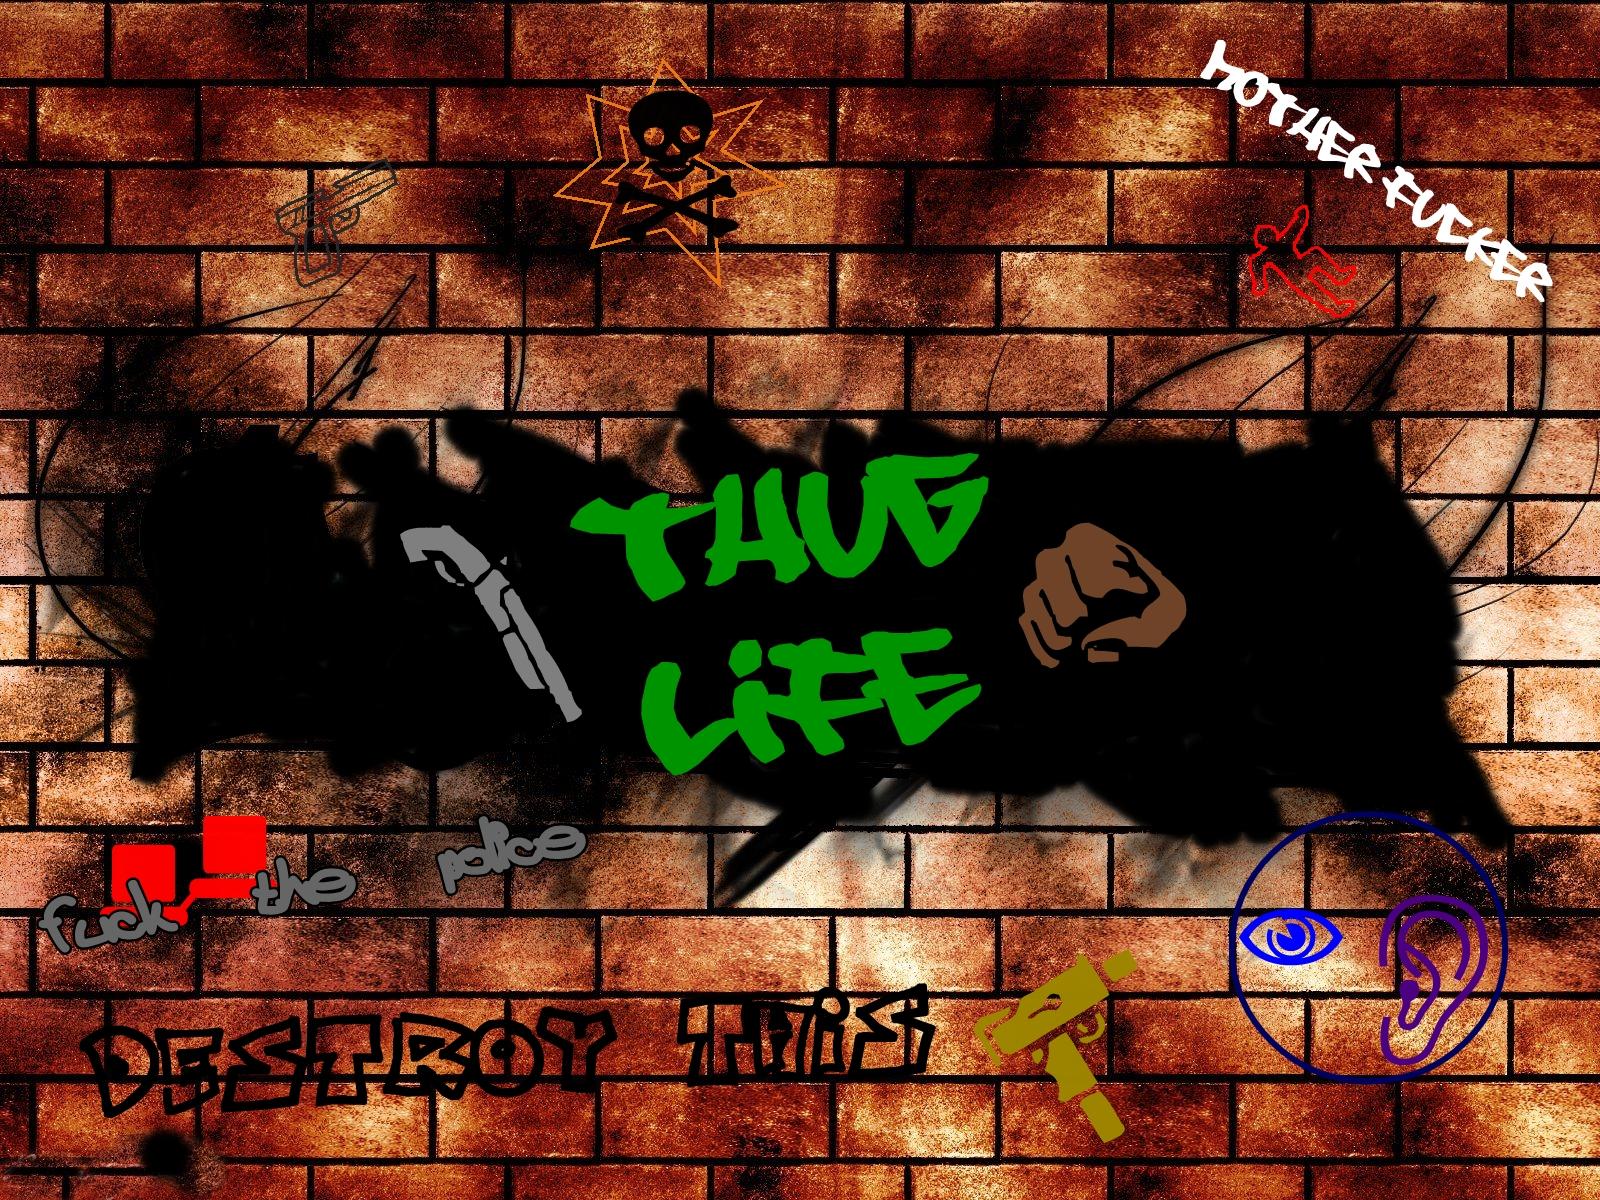 Thug Life Graffiti Graffiti Thug Life by